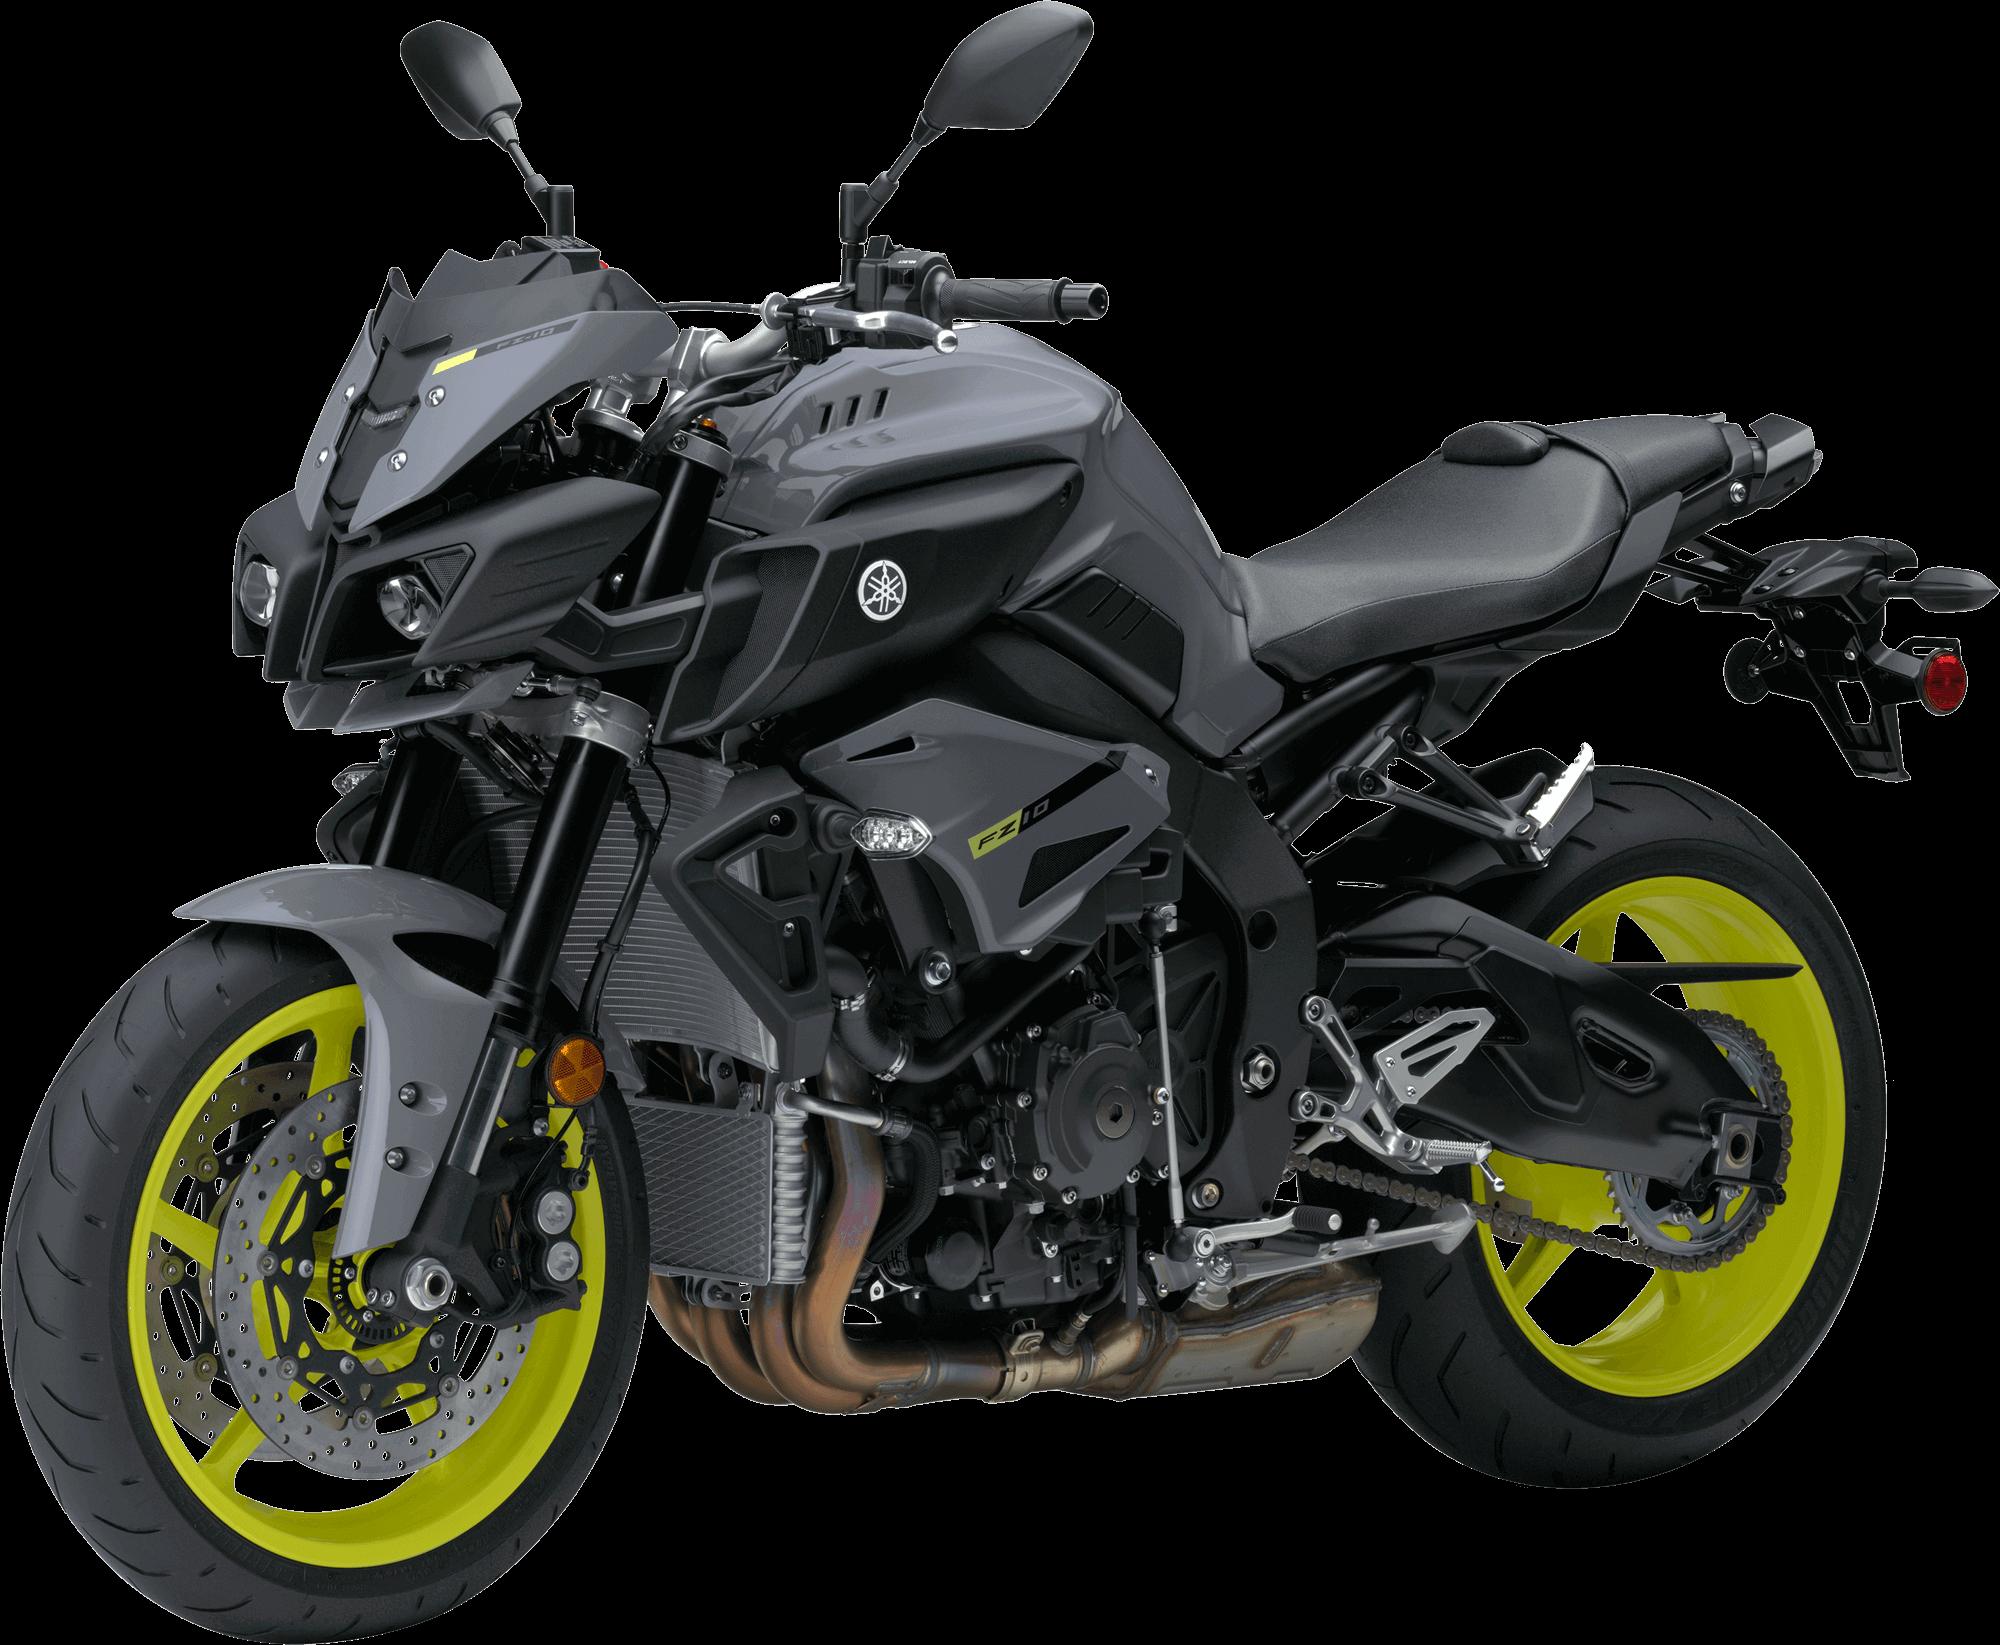 3840x2556 yamaha fz 10 4k best wallpaper hd | Motorcycle